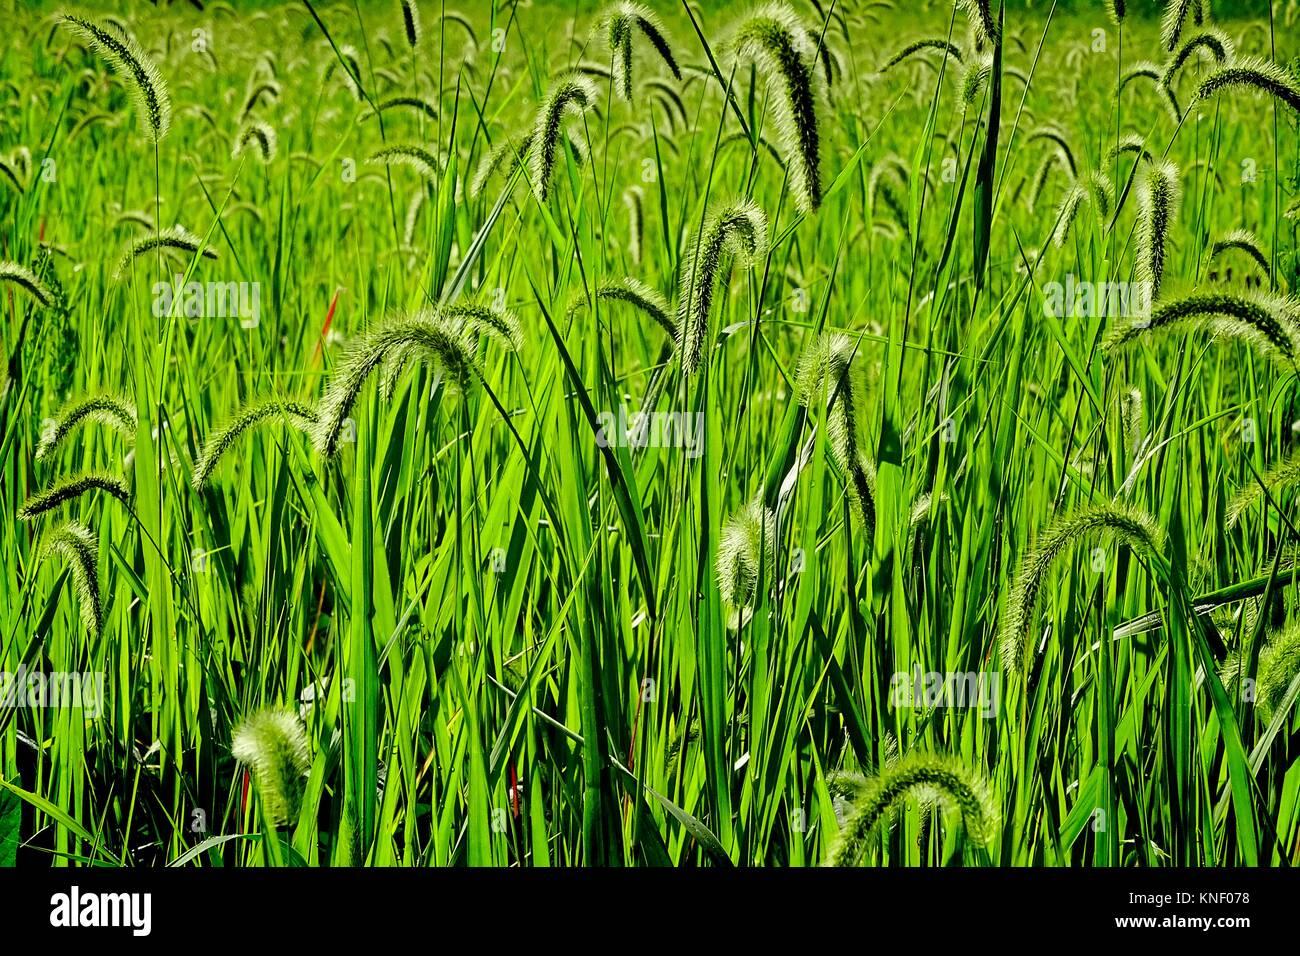 Wild grasses fill a field, Pennsylvania, USA. - Stock Image